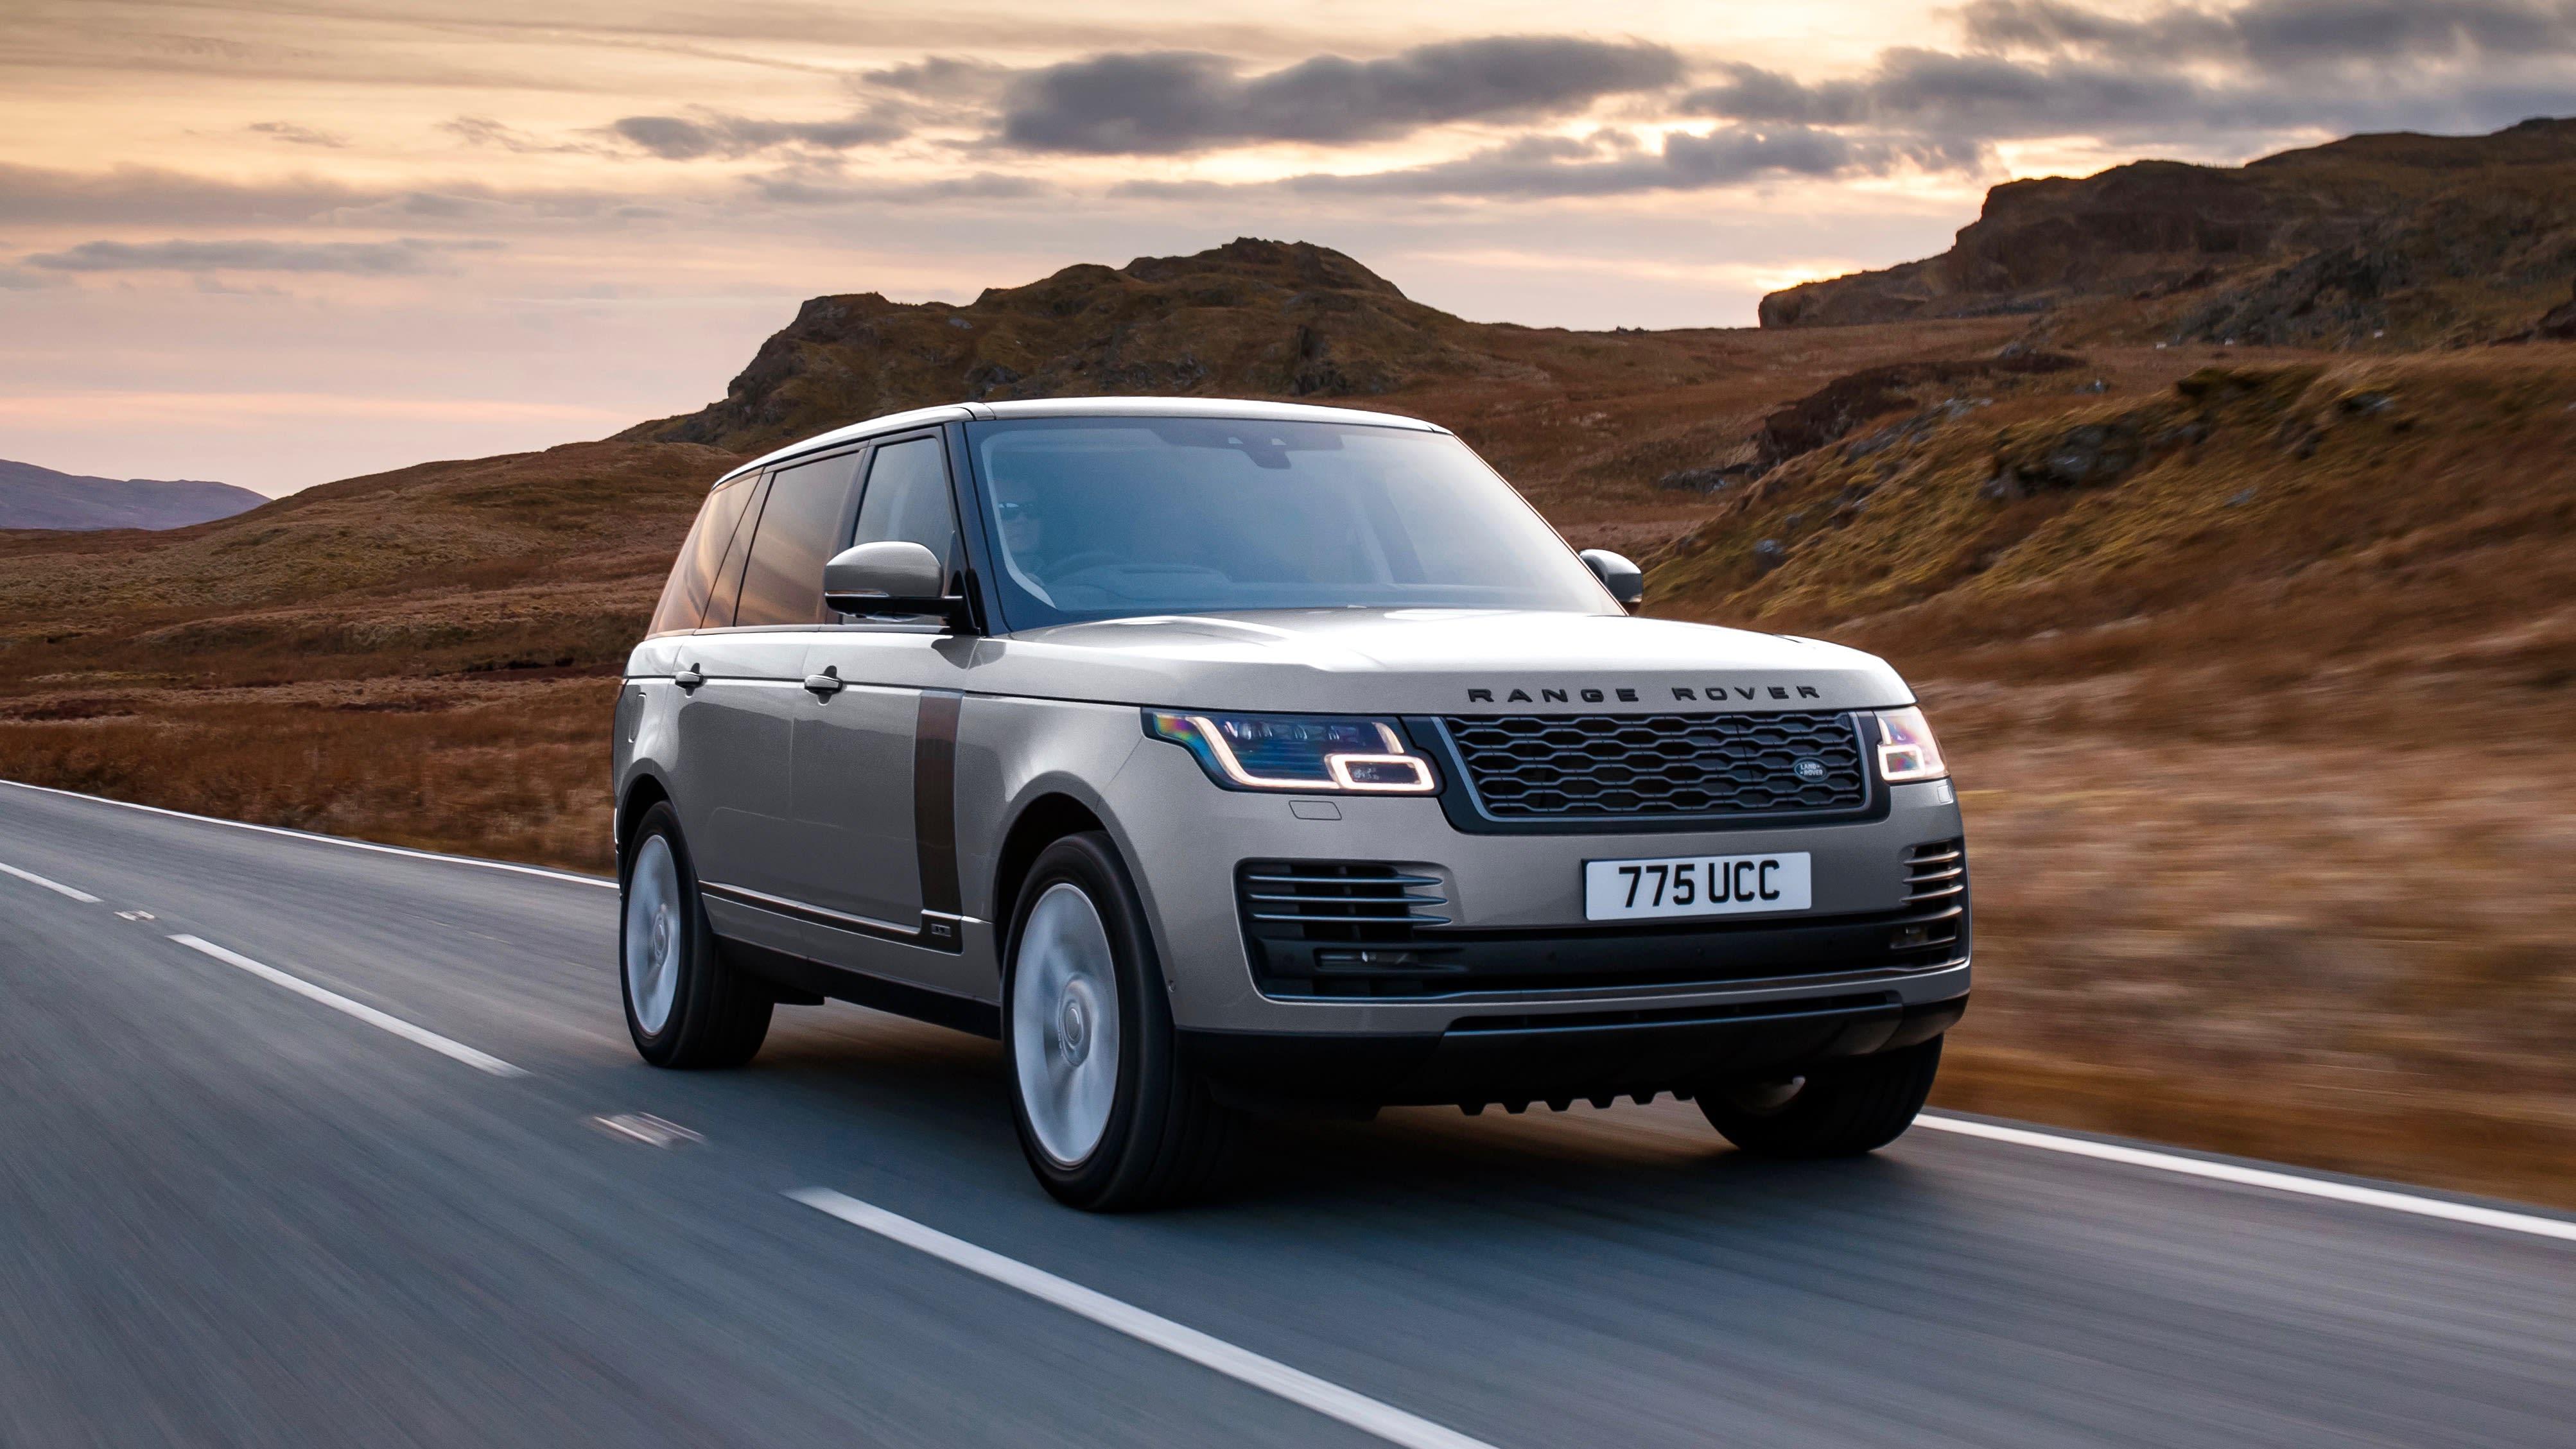 Range Rover Velar - World Auto Group